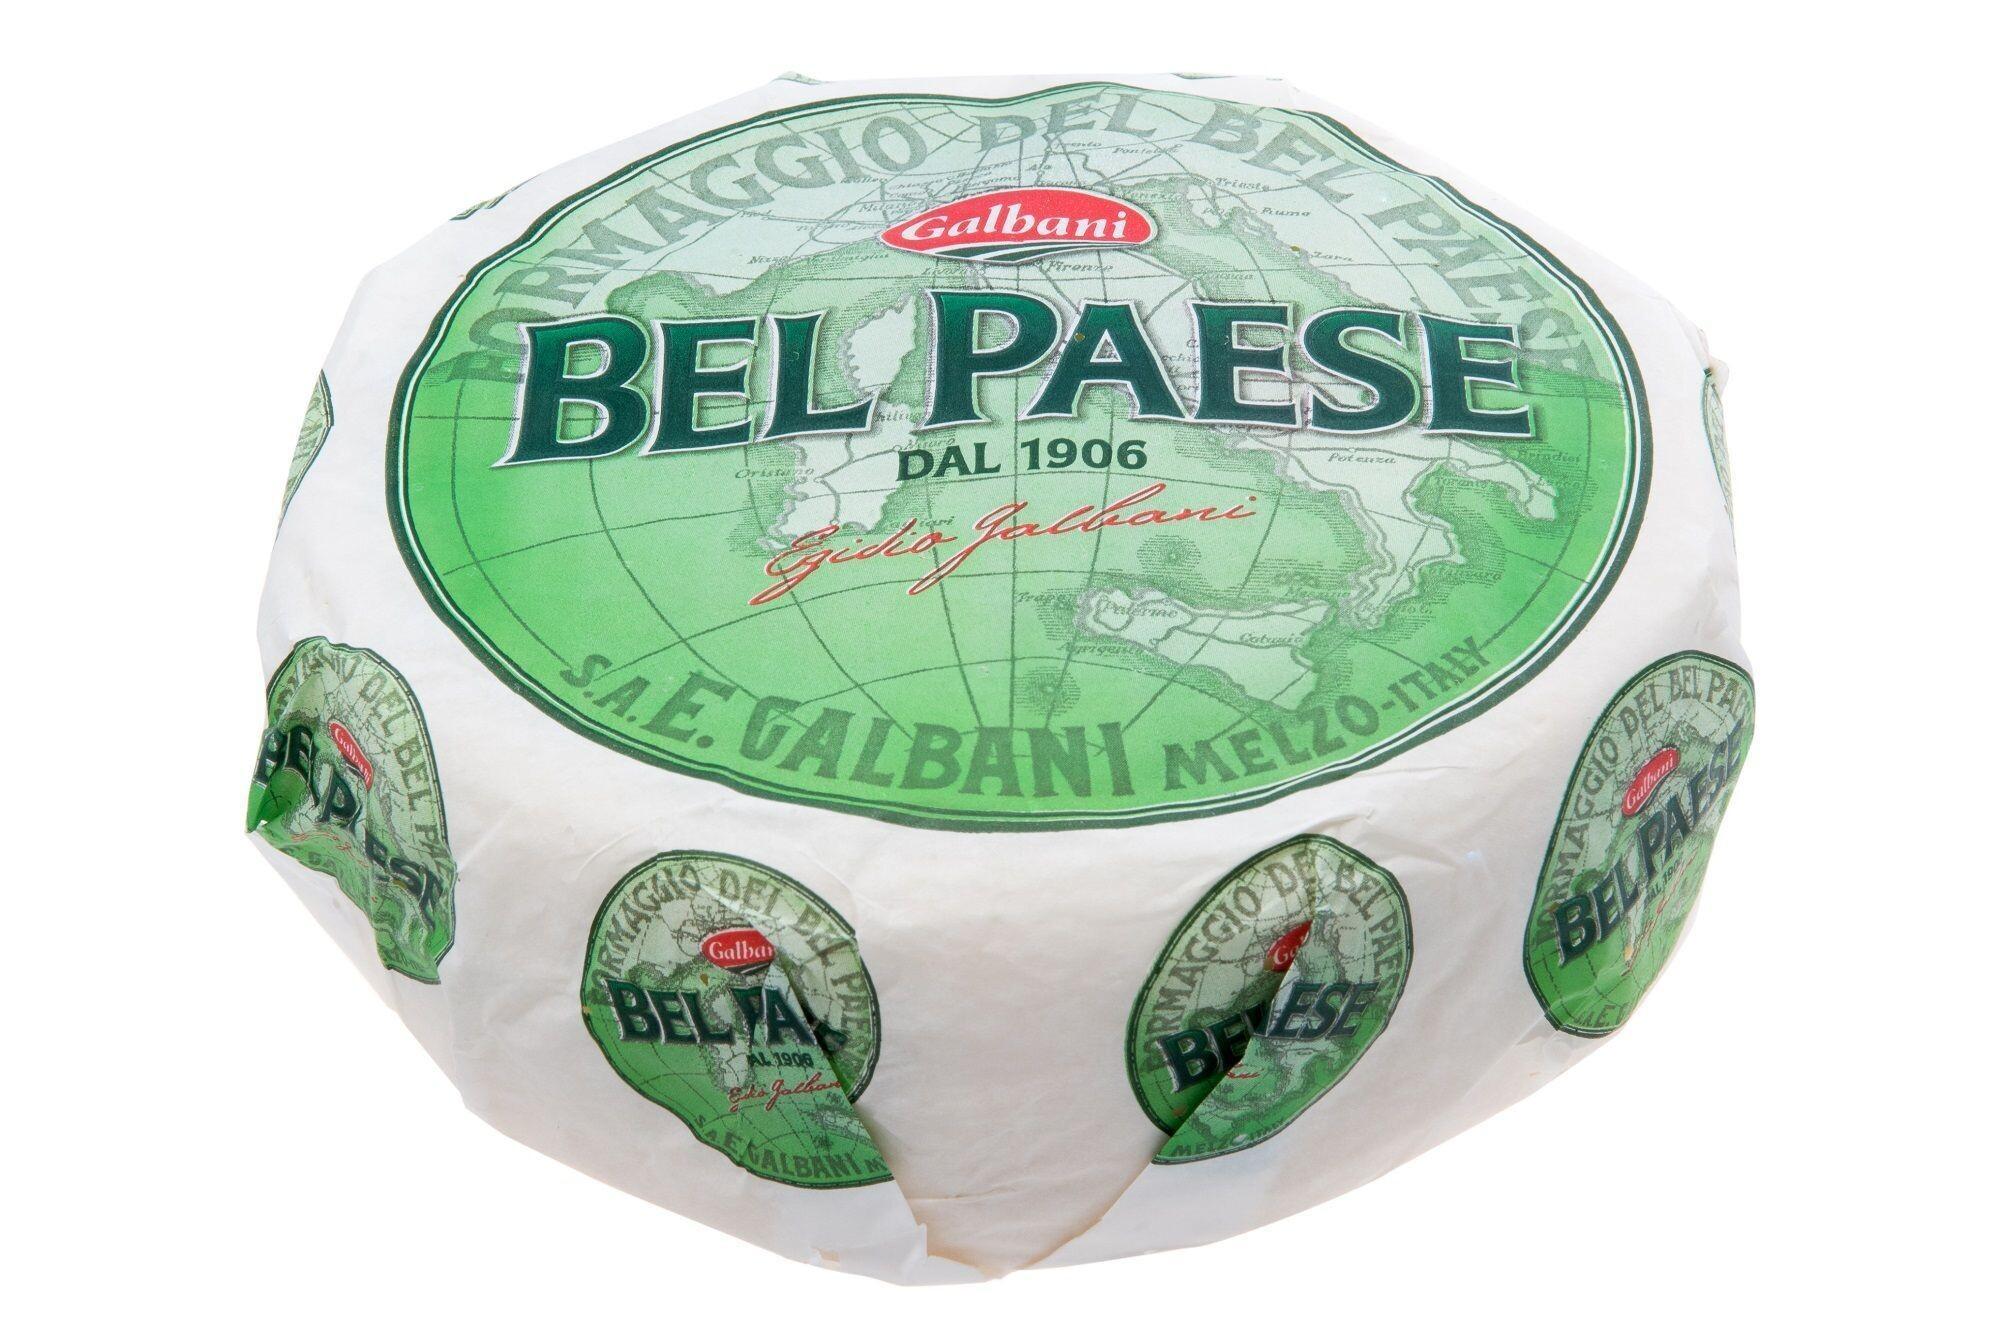 Cheese Bel Paese 2.55kg Galbani